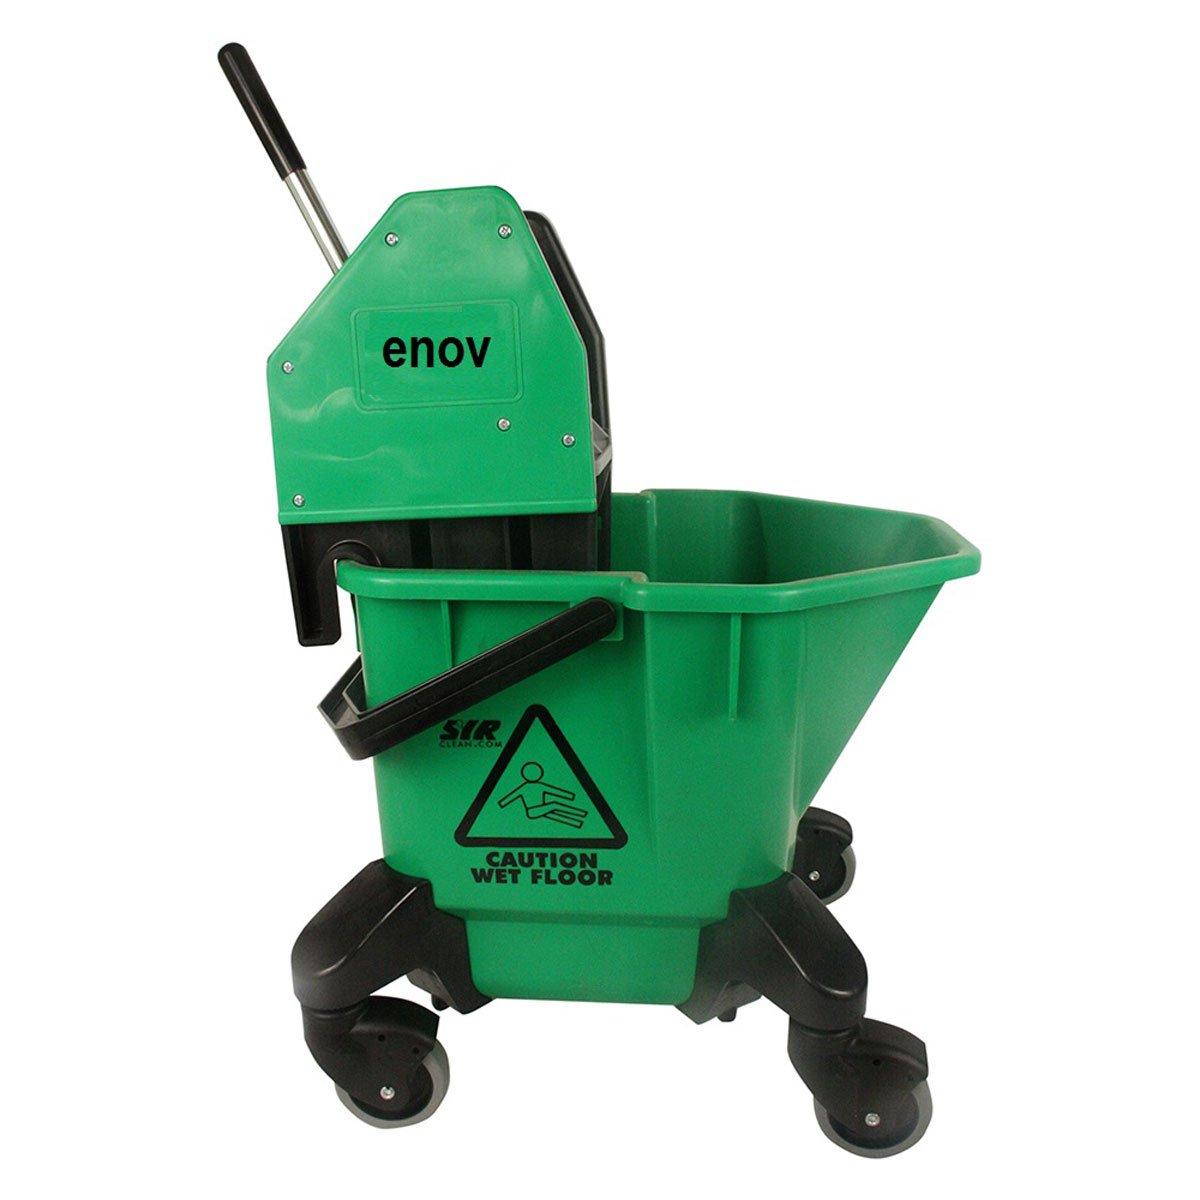 Green Enov HBR020-GR Kentucky Bucket and Wringer 20 L Capacity